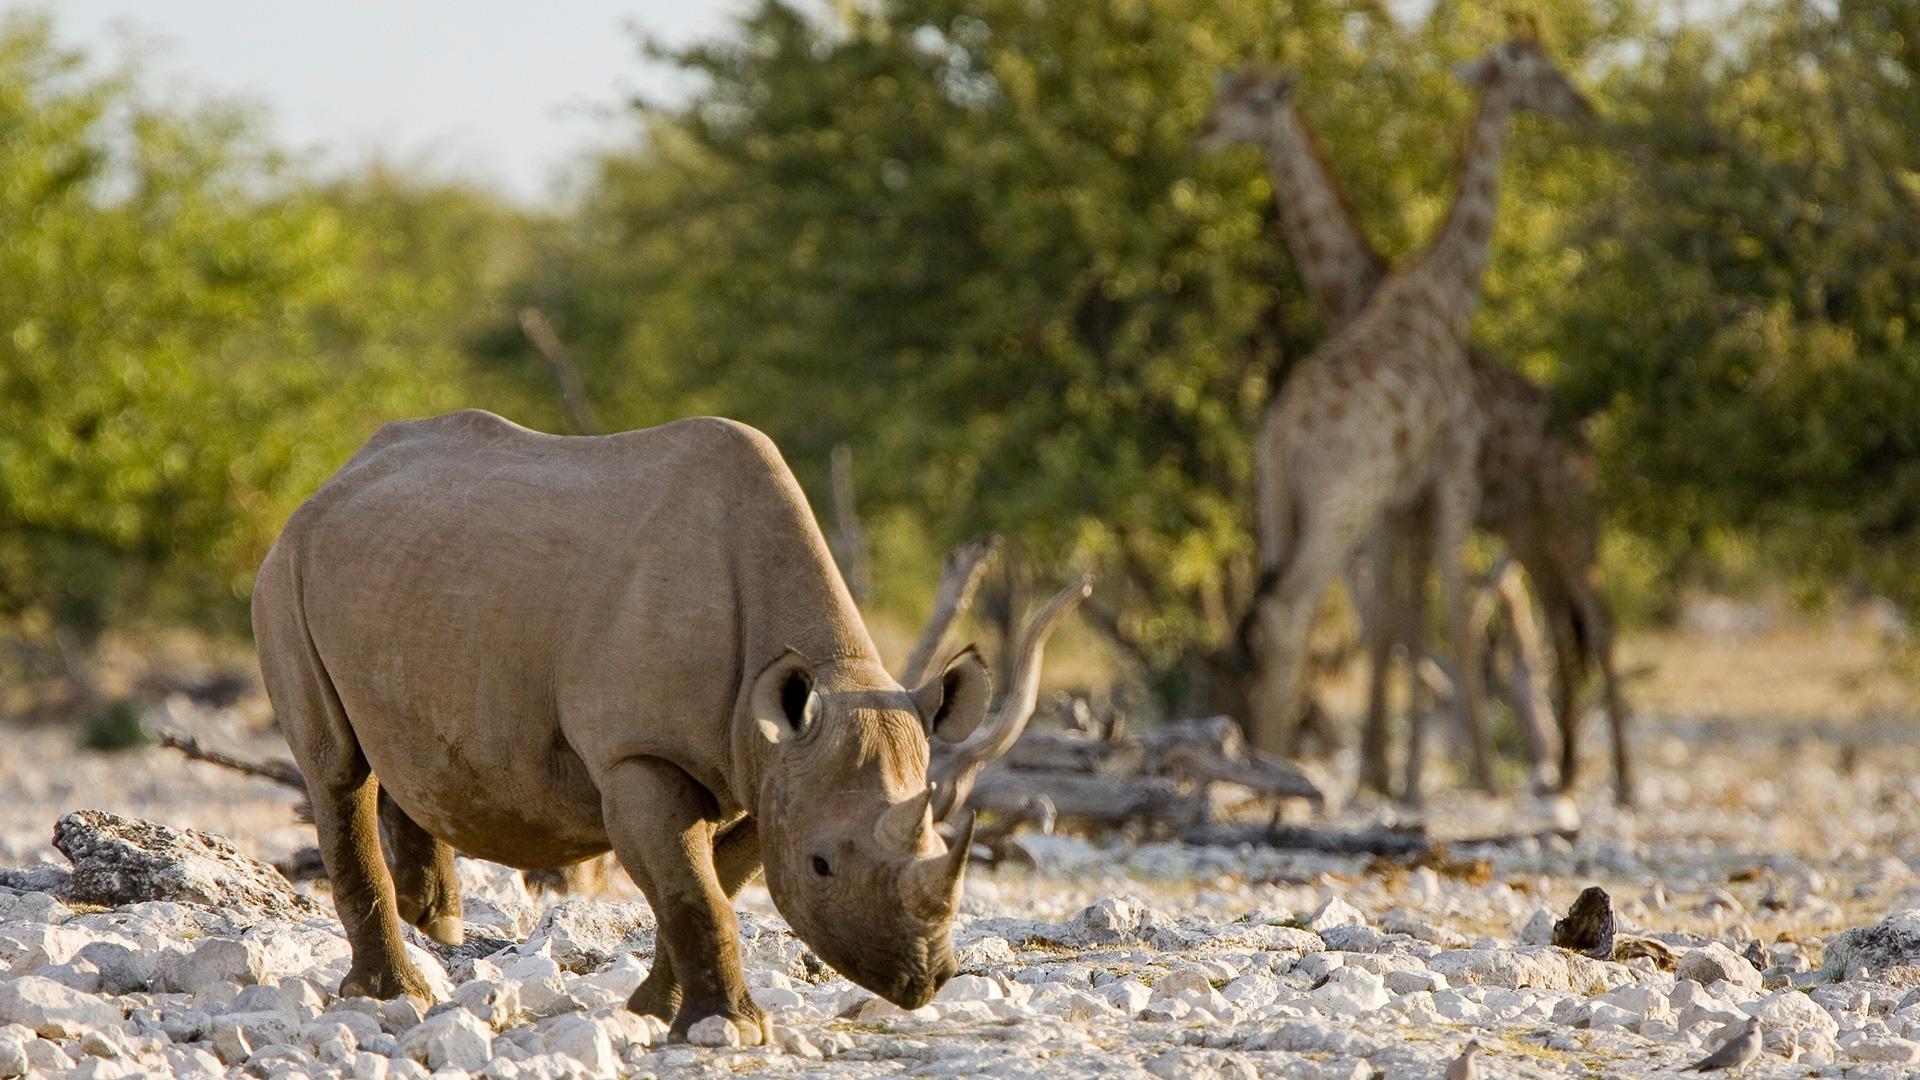 Black rhino and giraffe in Etosha National Park, Namibia